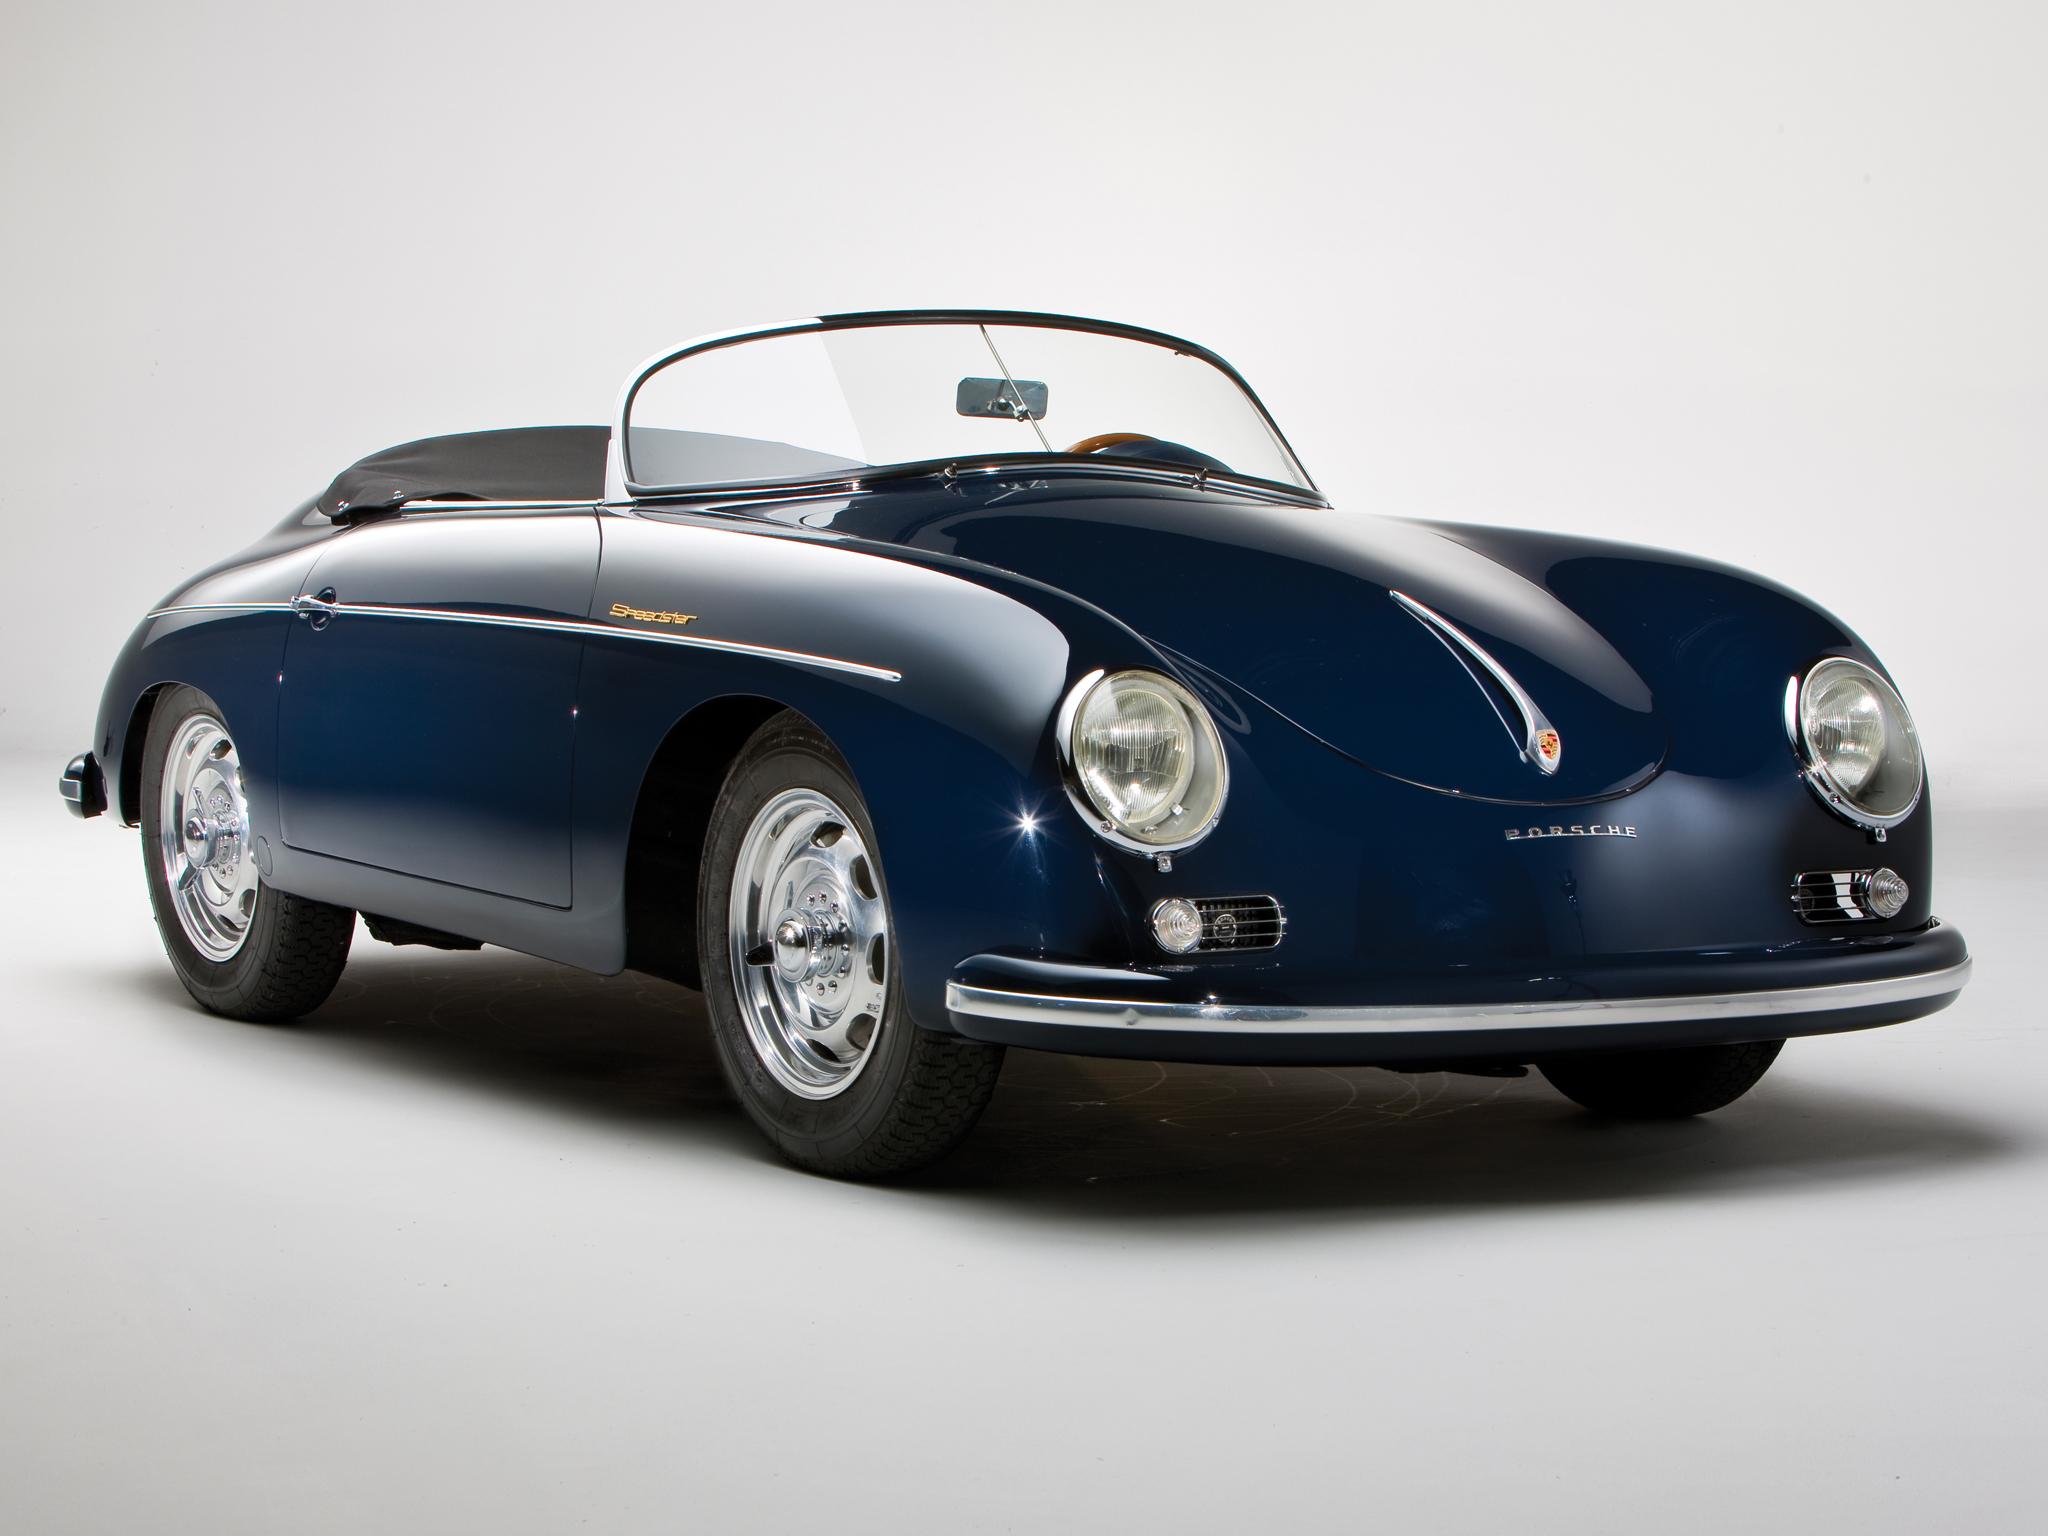 1958 Porsche 356a 1600 Speedster Us Spec T 2 Retro